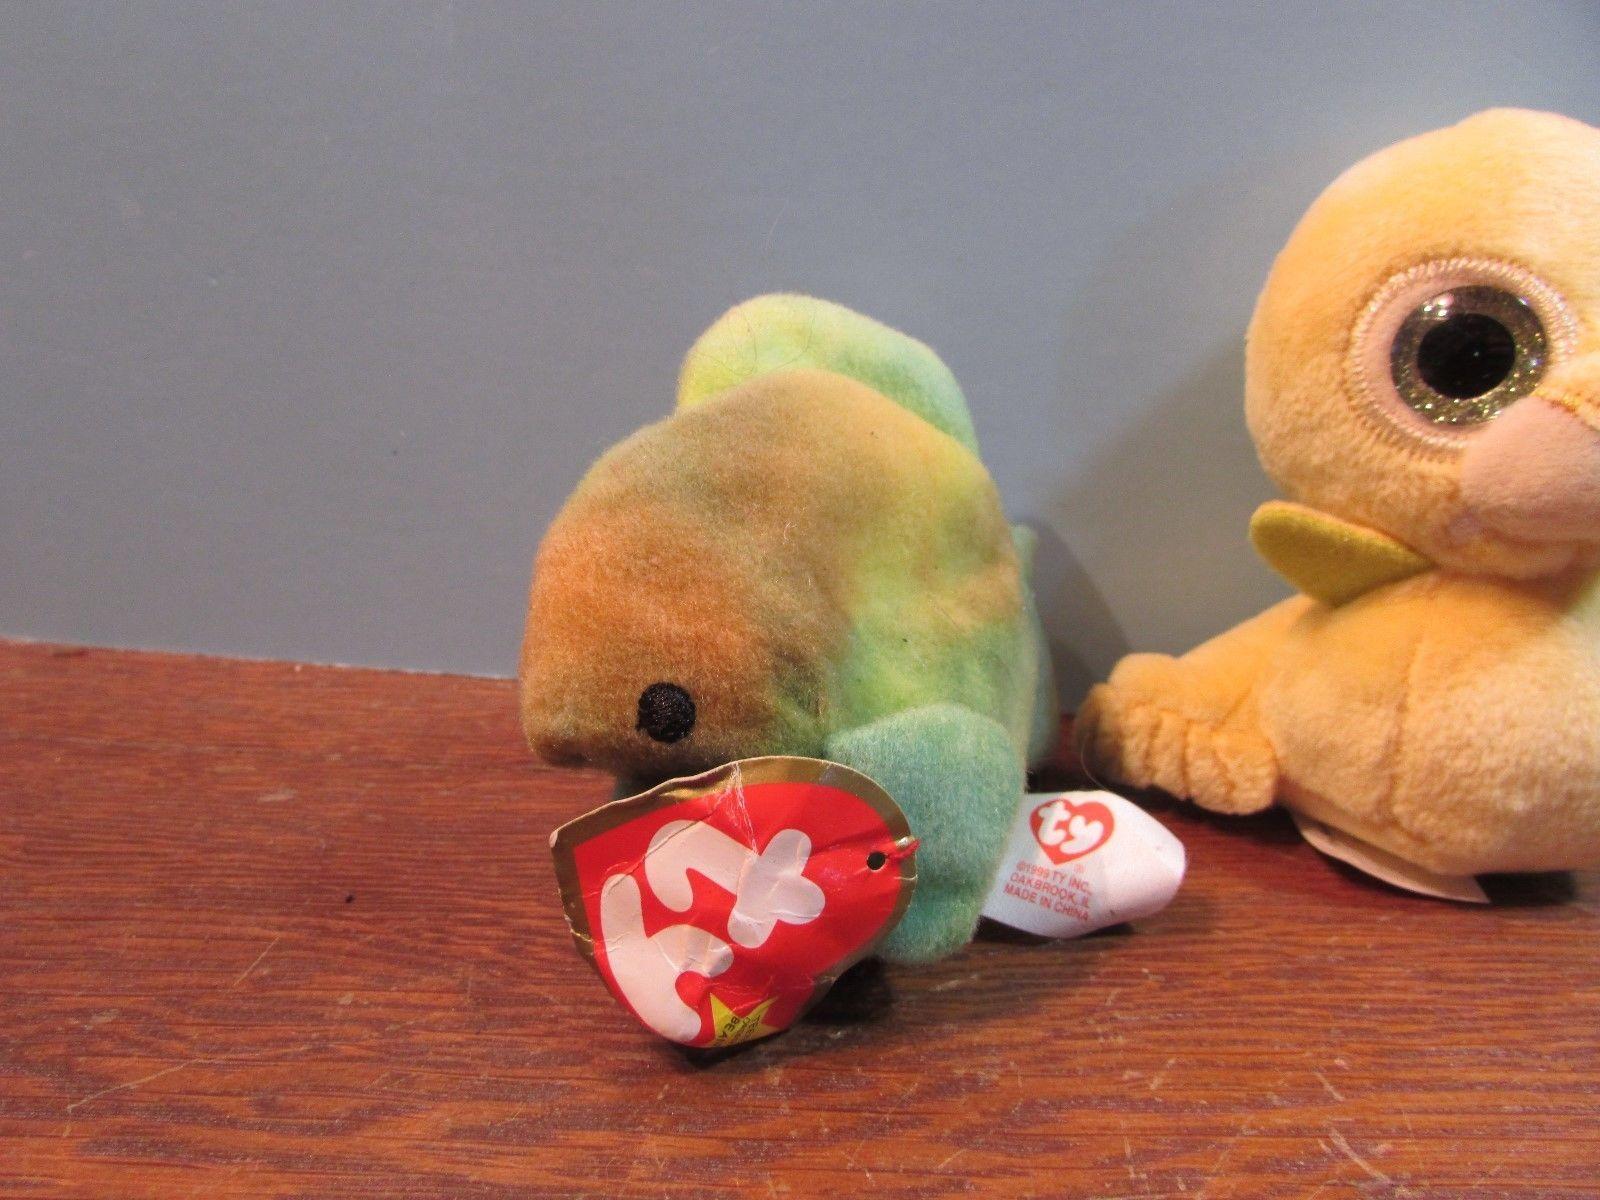 fd5029e07f4 LOT OF 2 TY Beanie Babies Baby plush 3